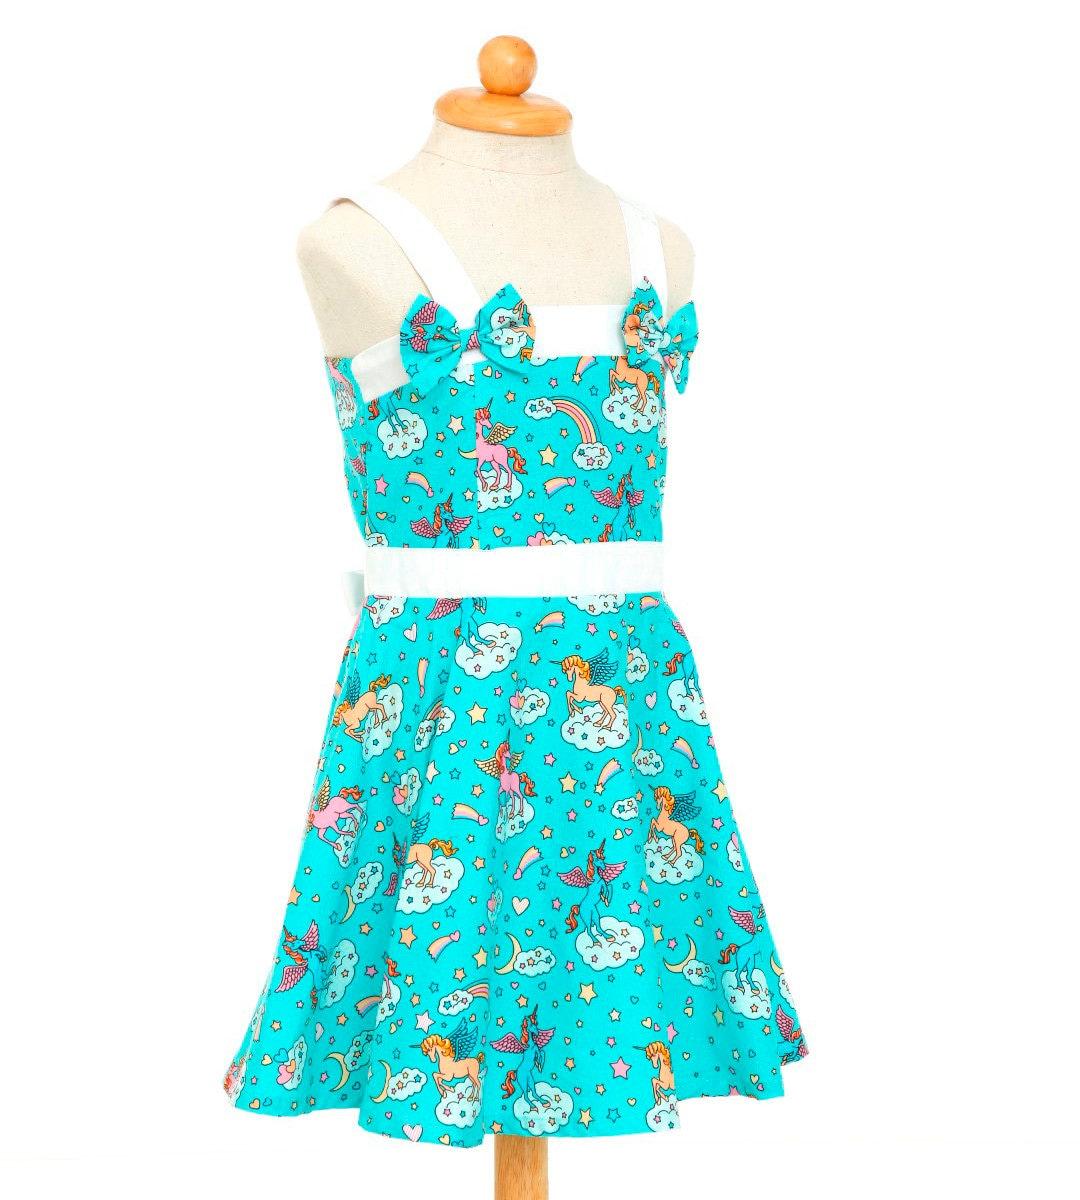 Teal Unicorn Dress Girls Dress Birthday Dress Party Dress